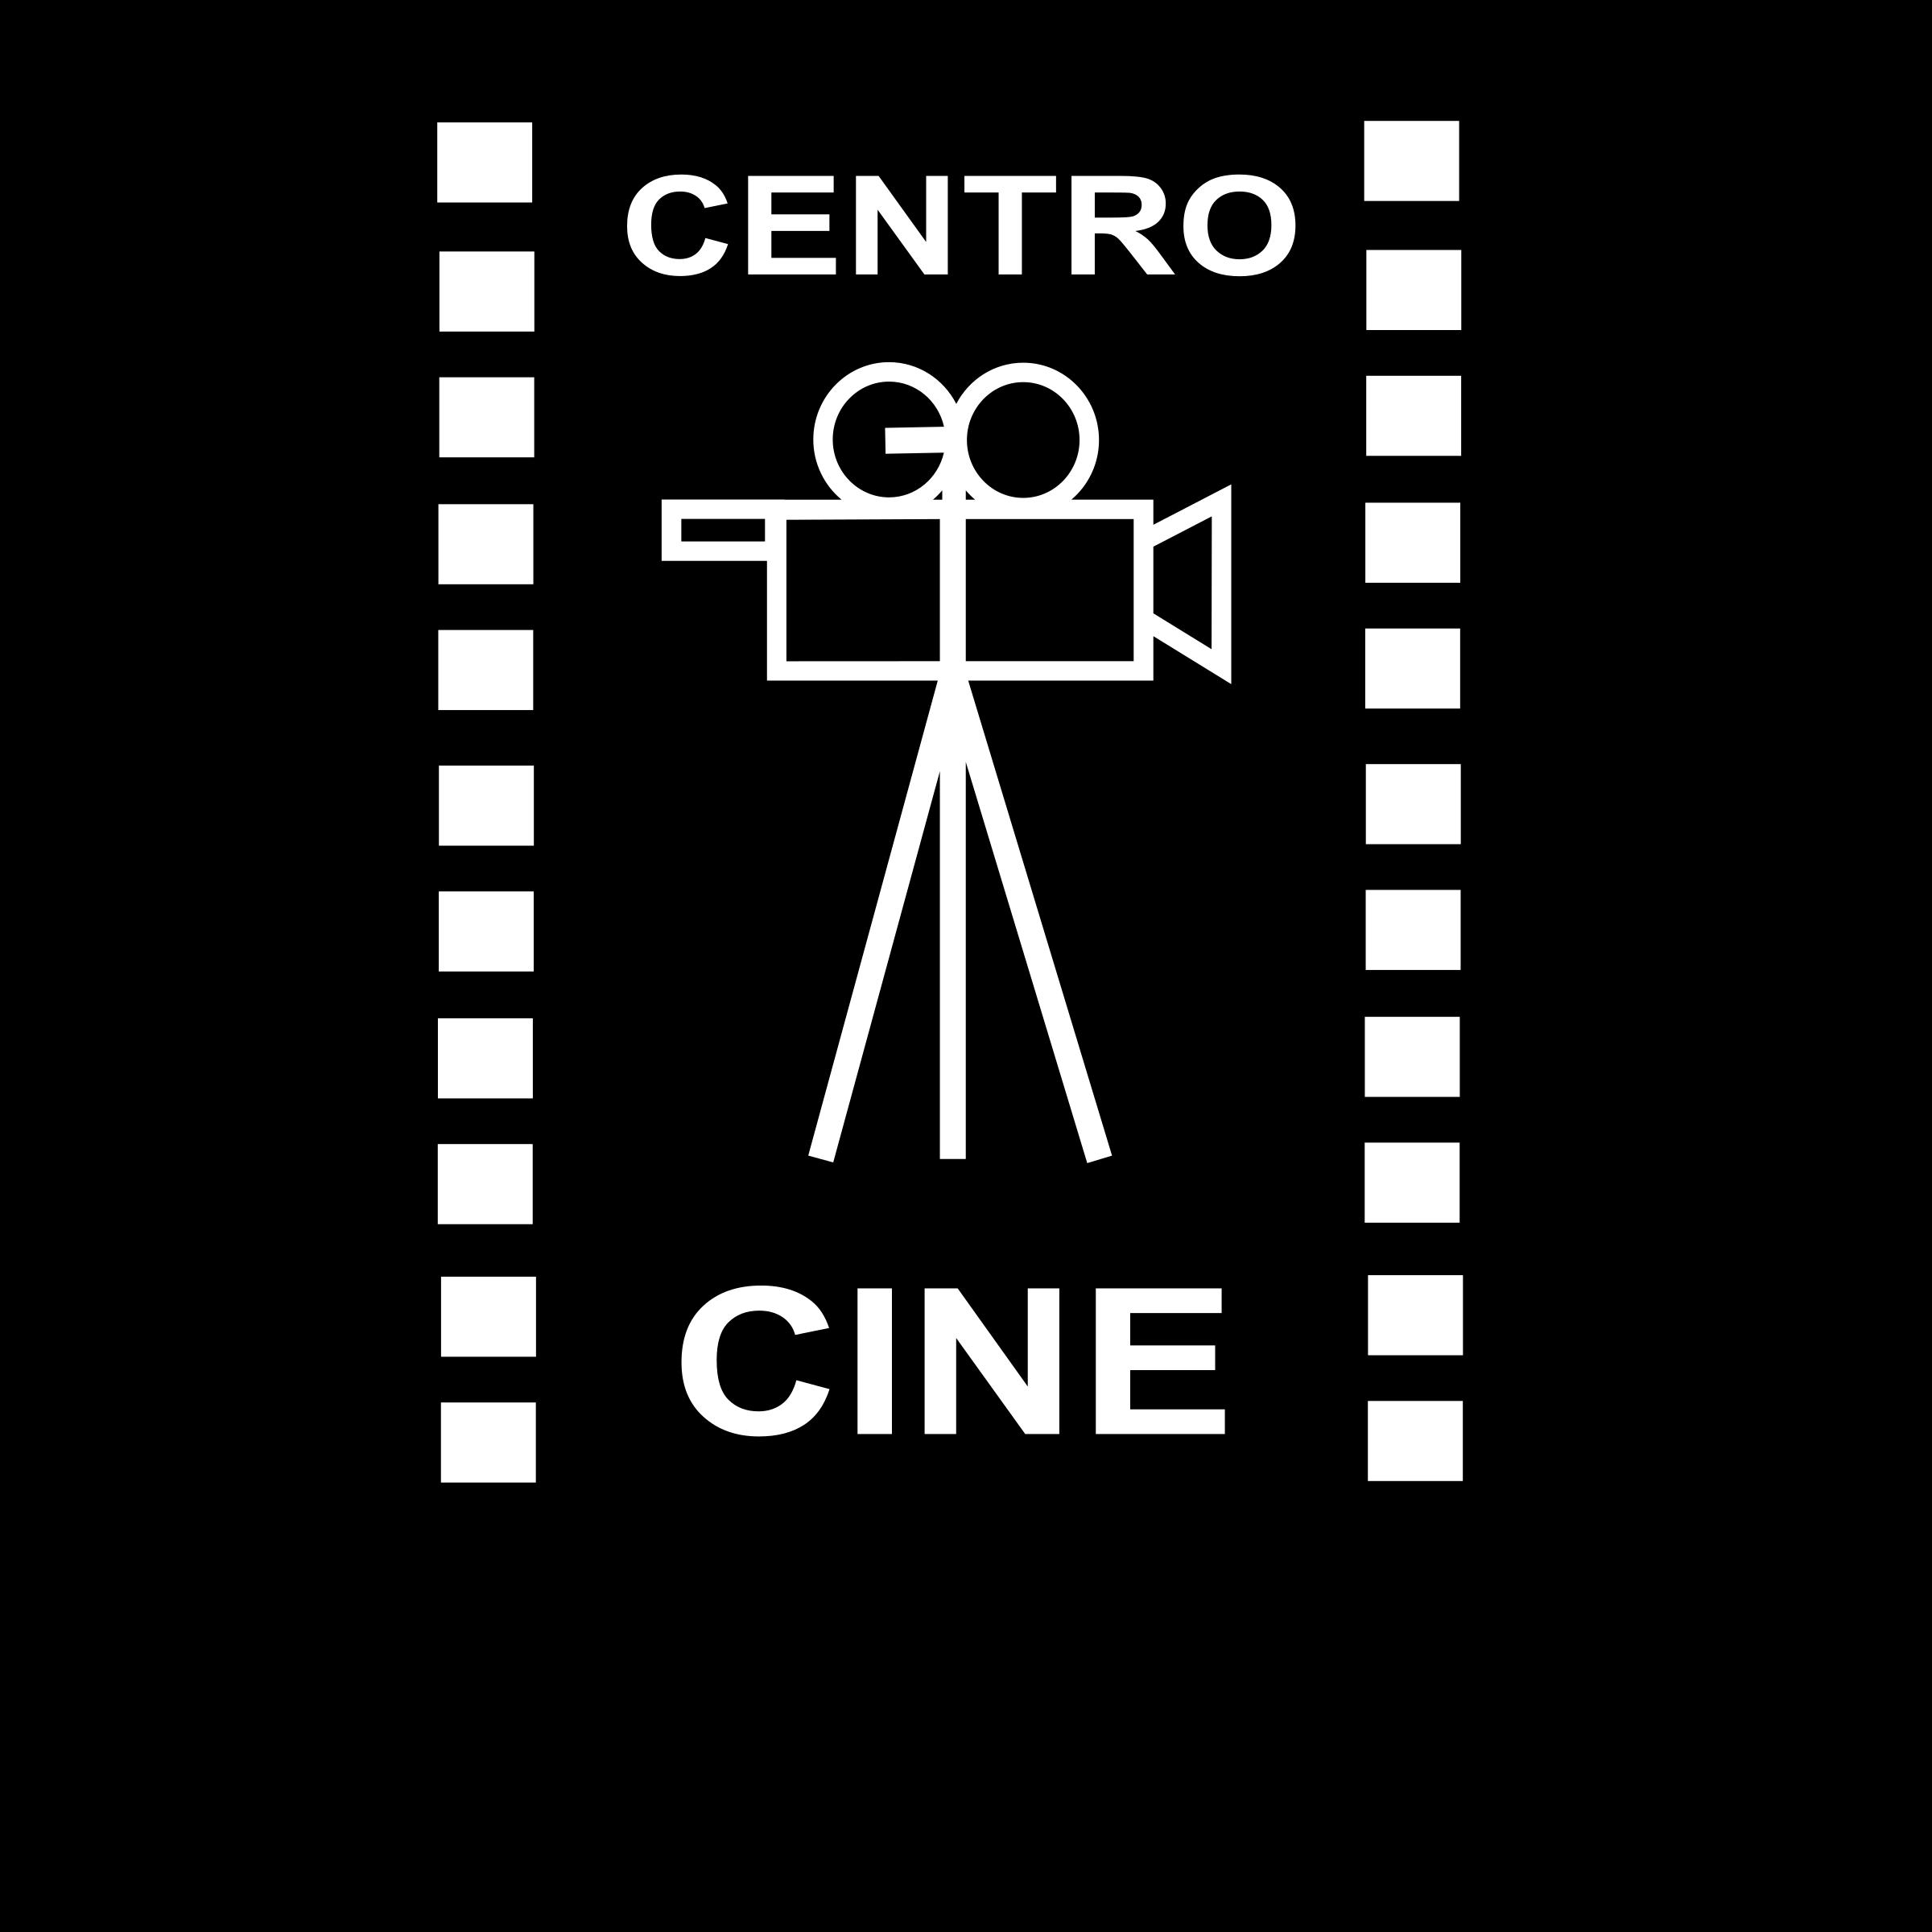 Centro De Cine Costarricense Logo Png Transparent Svg Vector